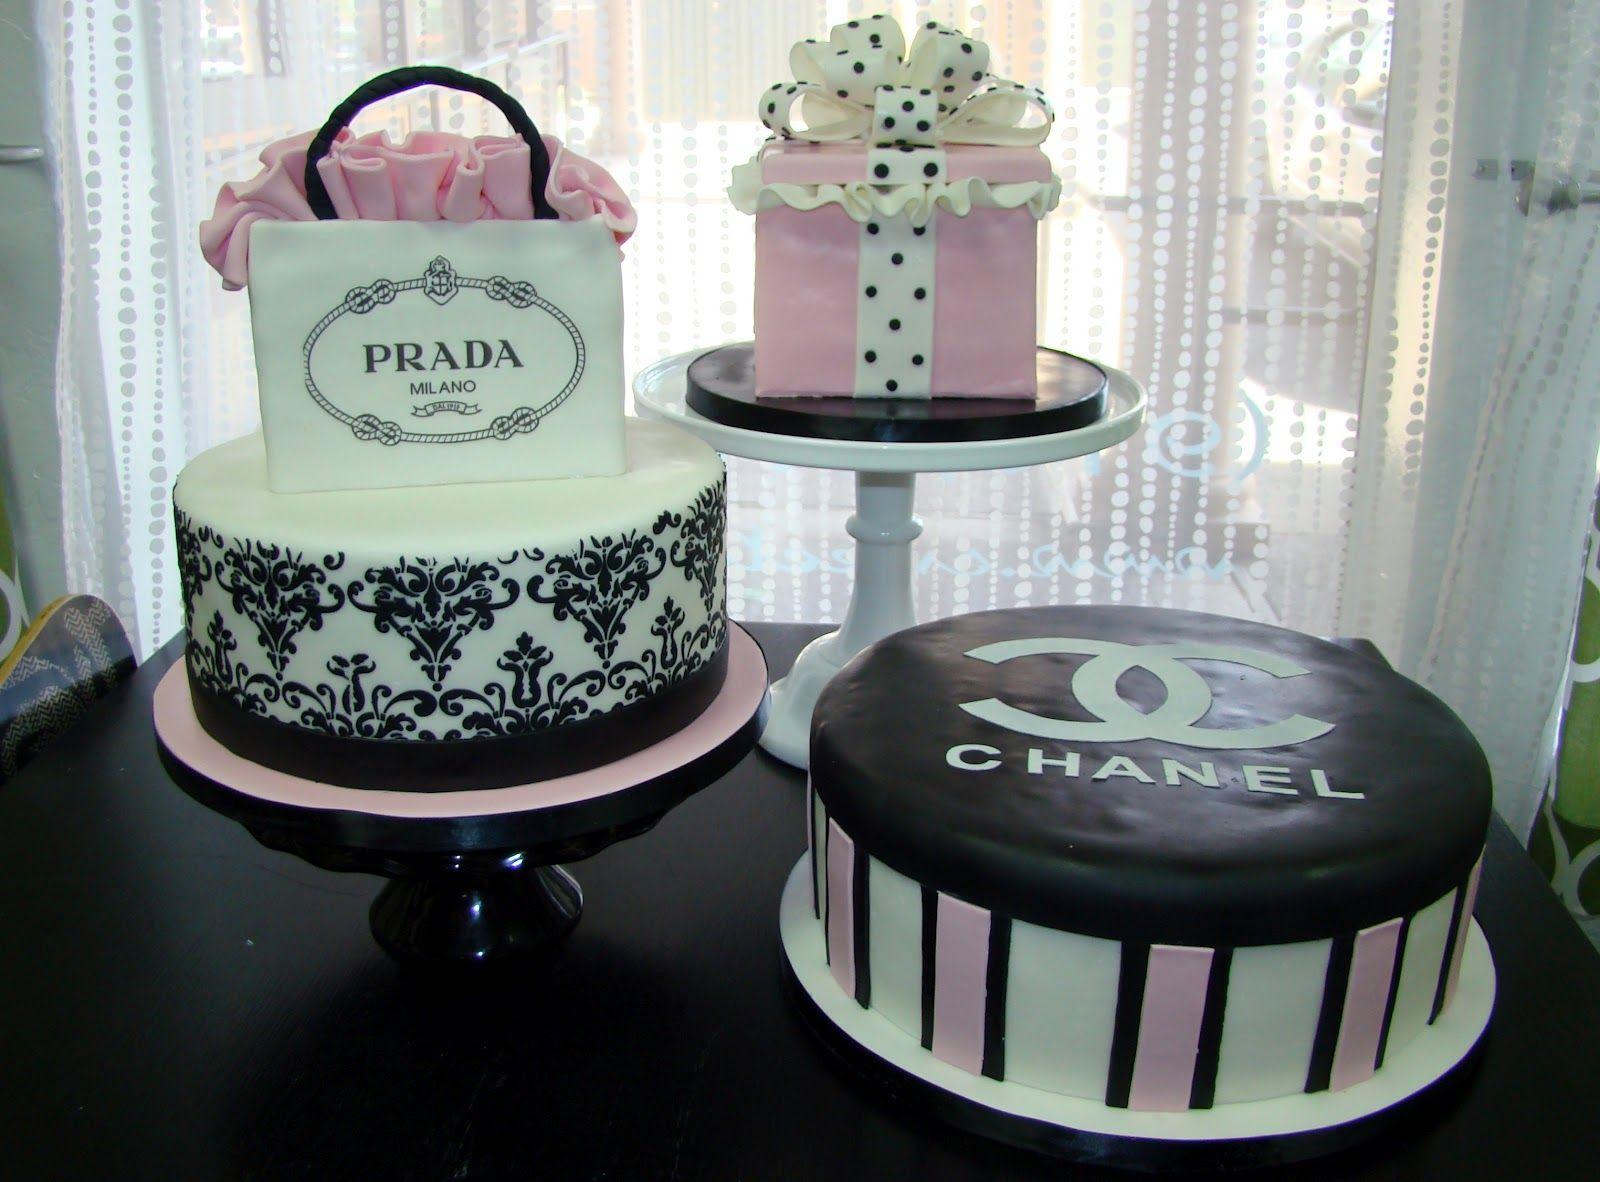 049268a96efe Prada cake | Cakes in 2019 | Fashionista cake, Chanel cake, Cake